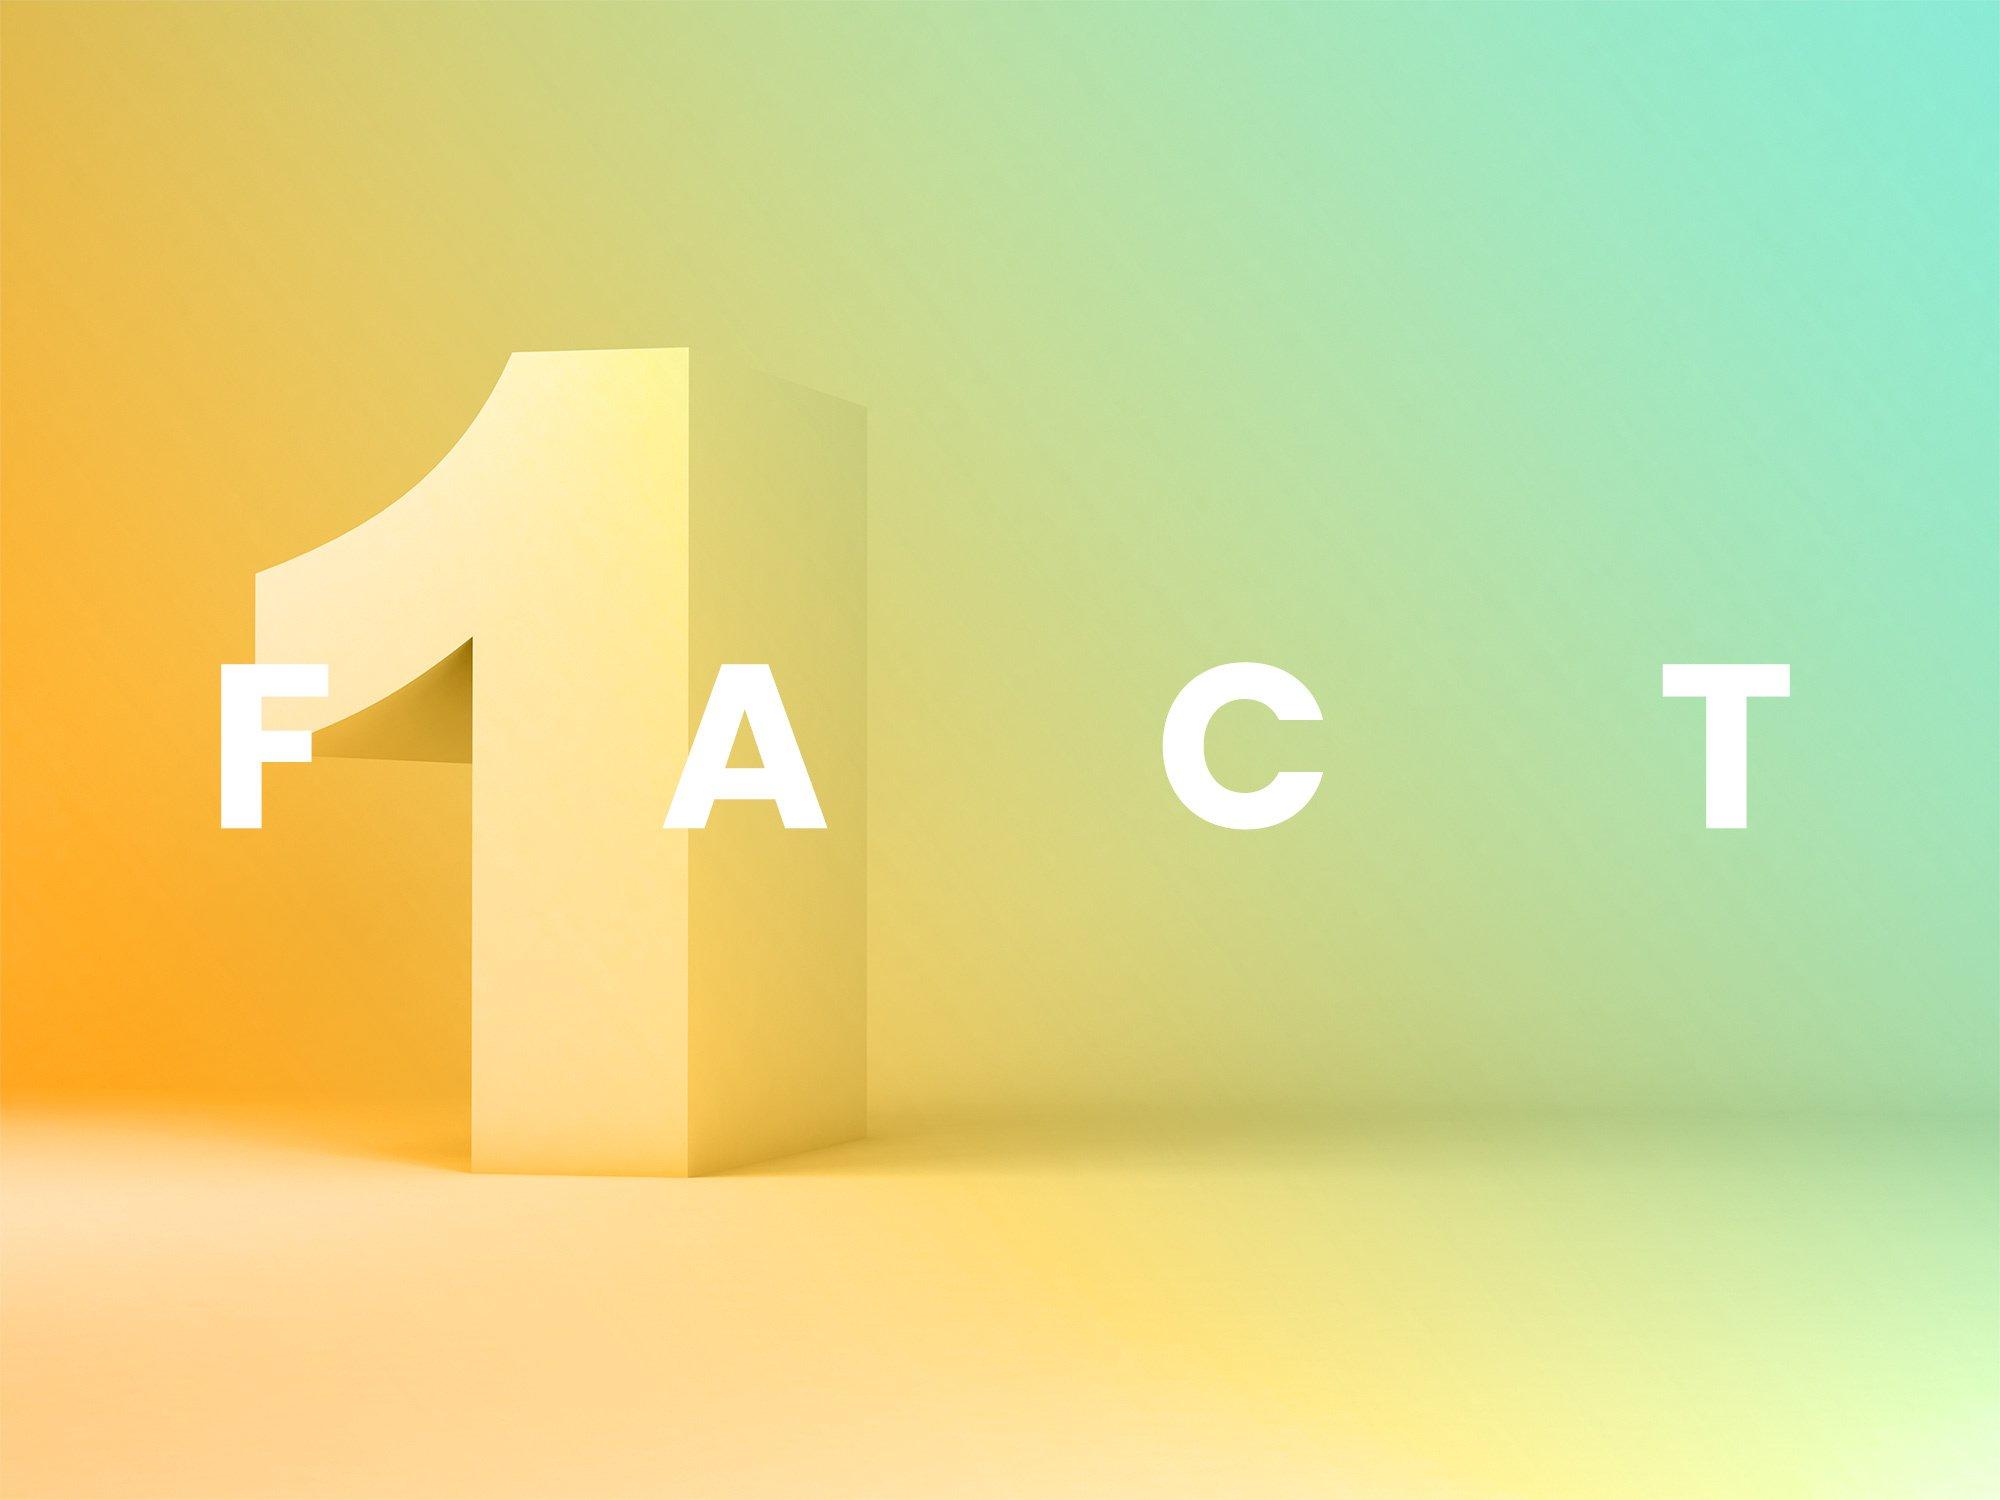 1-fact-BG4-opt